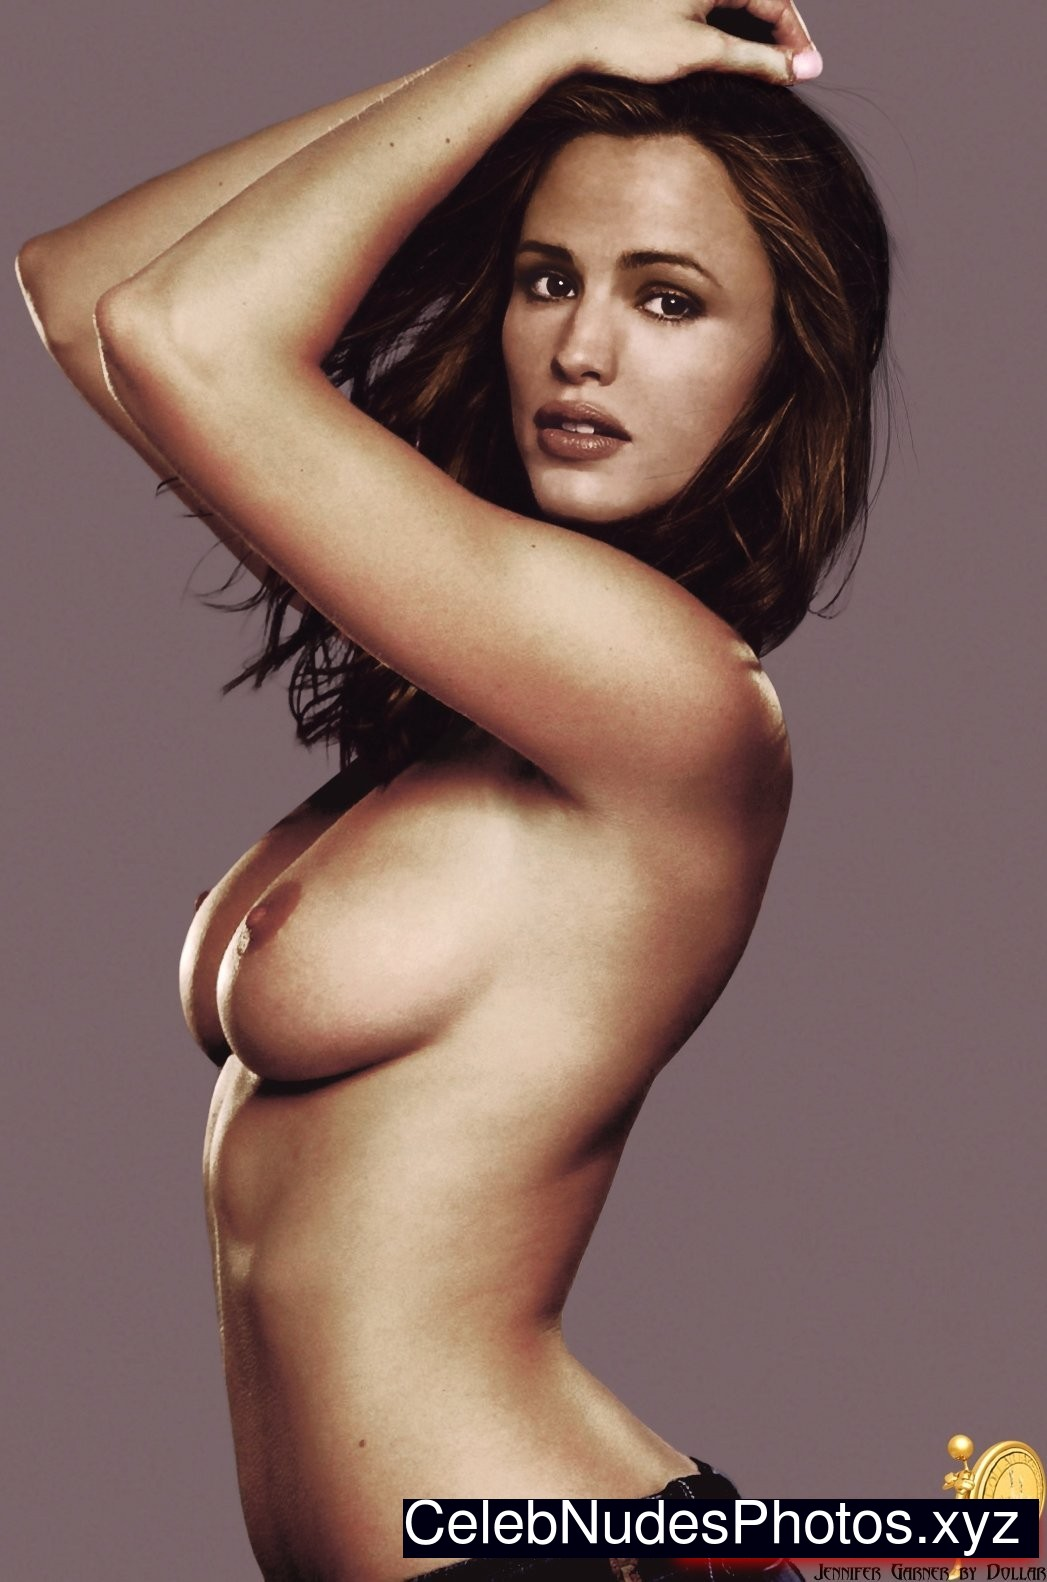 Jennifer Garner nude celebrity